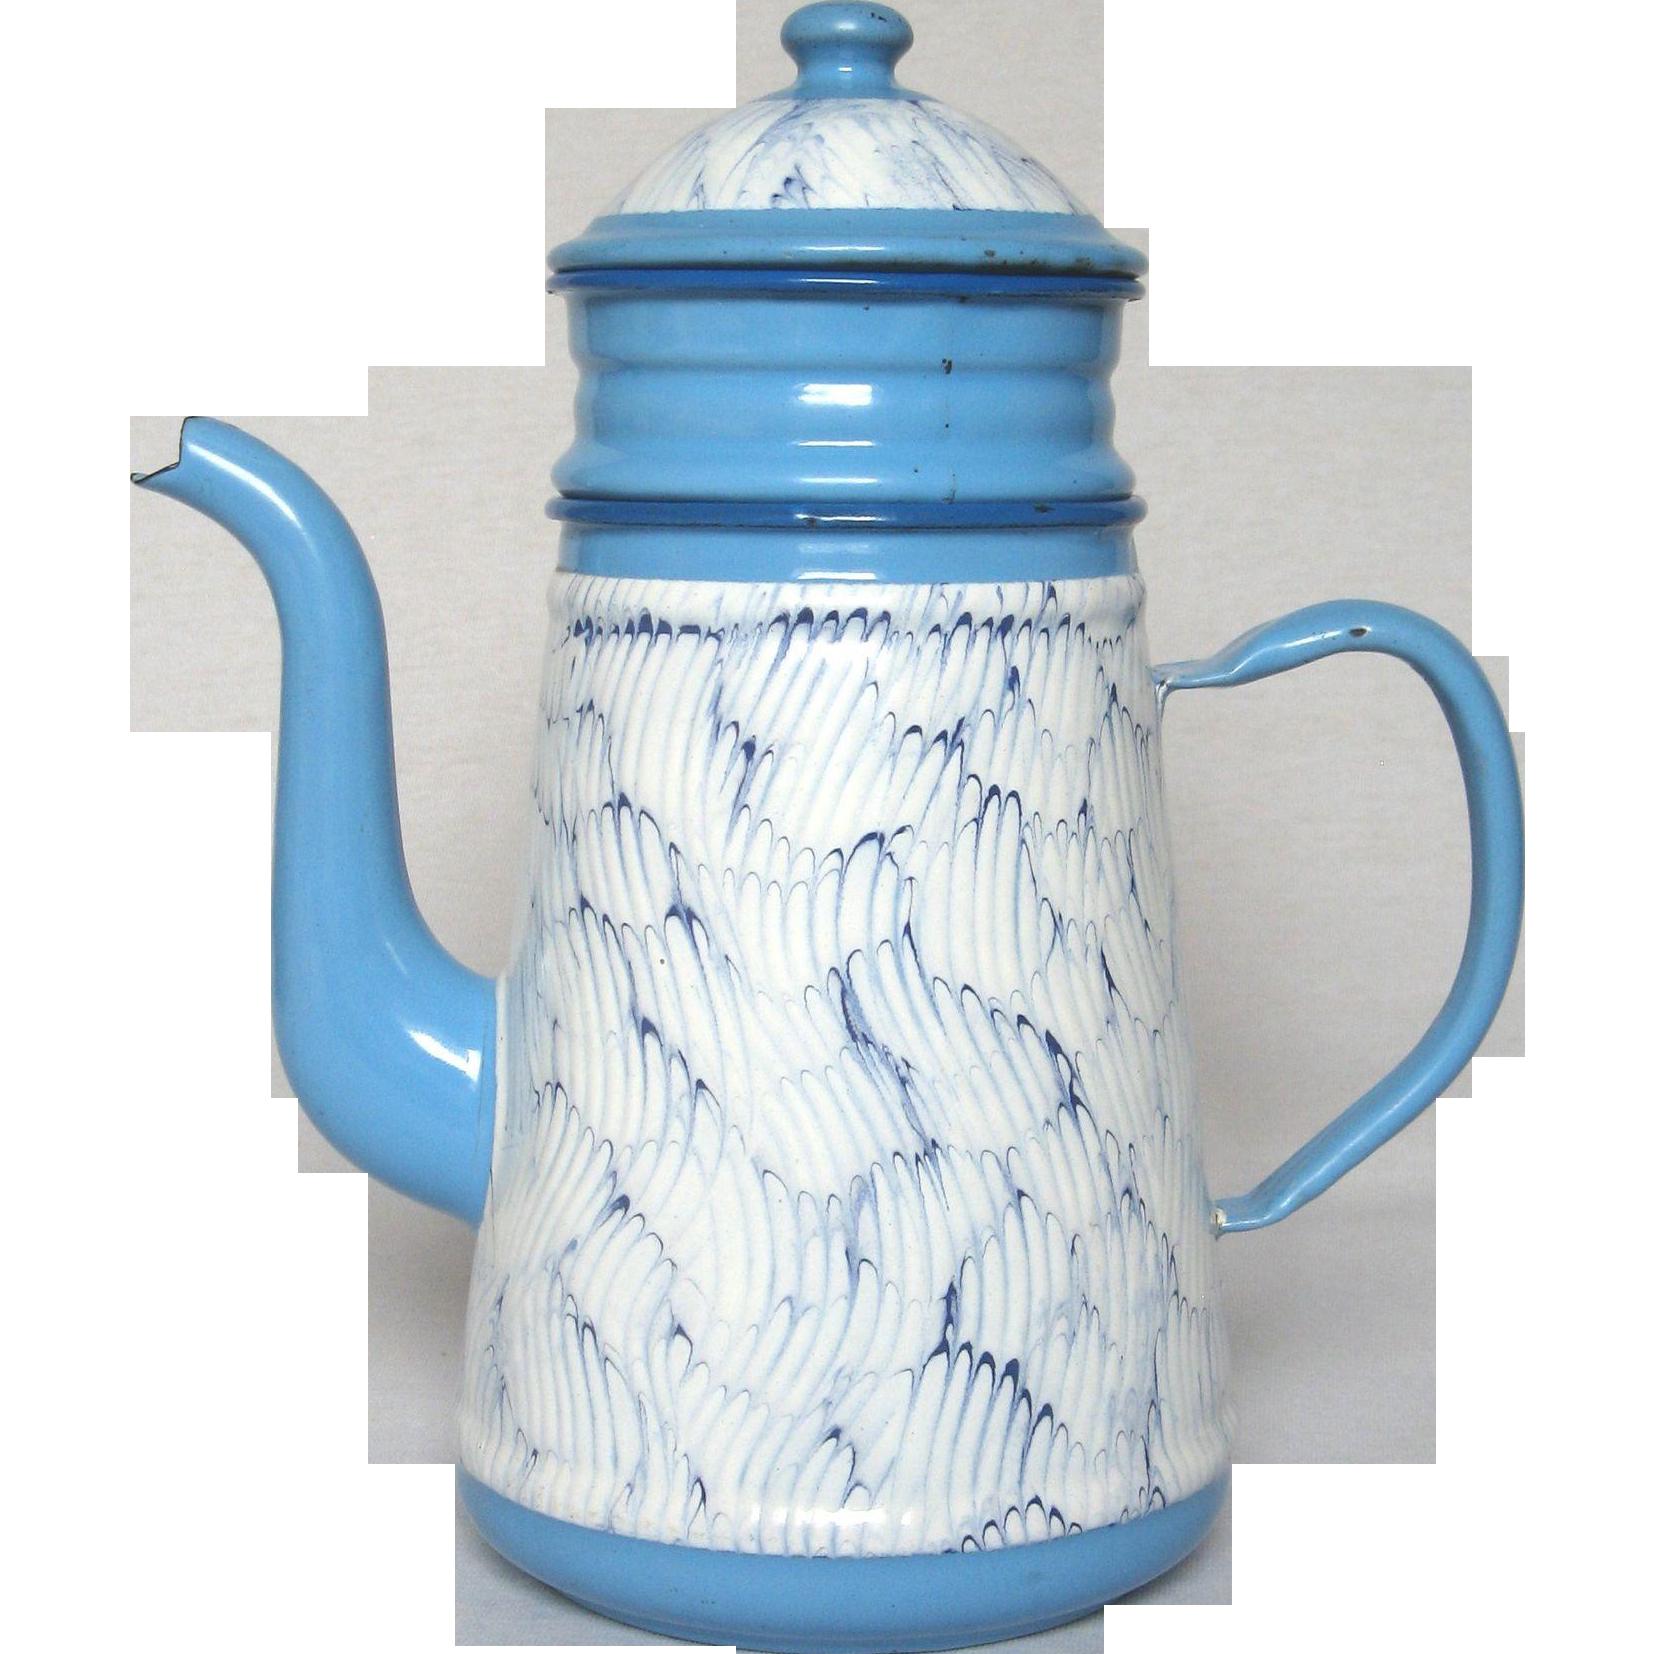 Blue Feathered Enamel French Graniteware Coffee Biggin